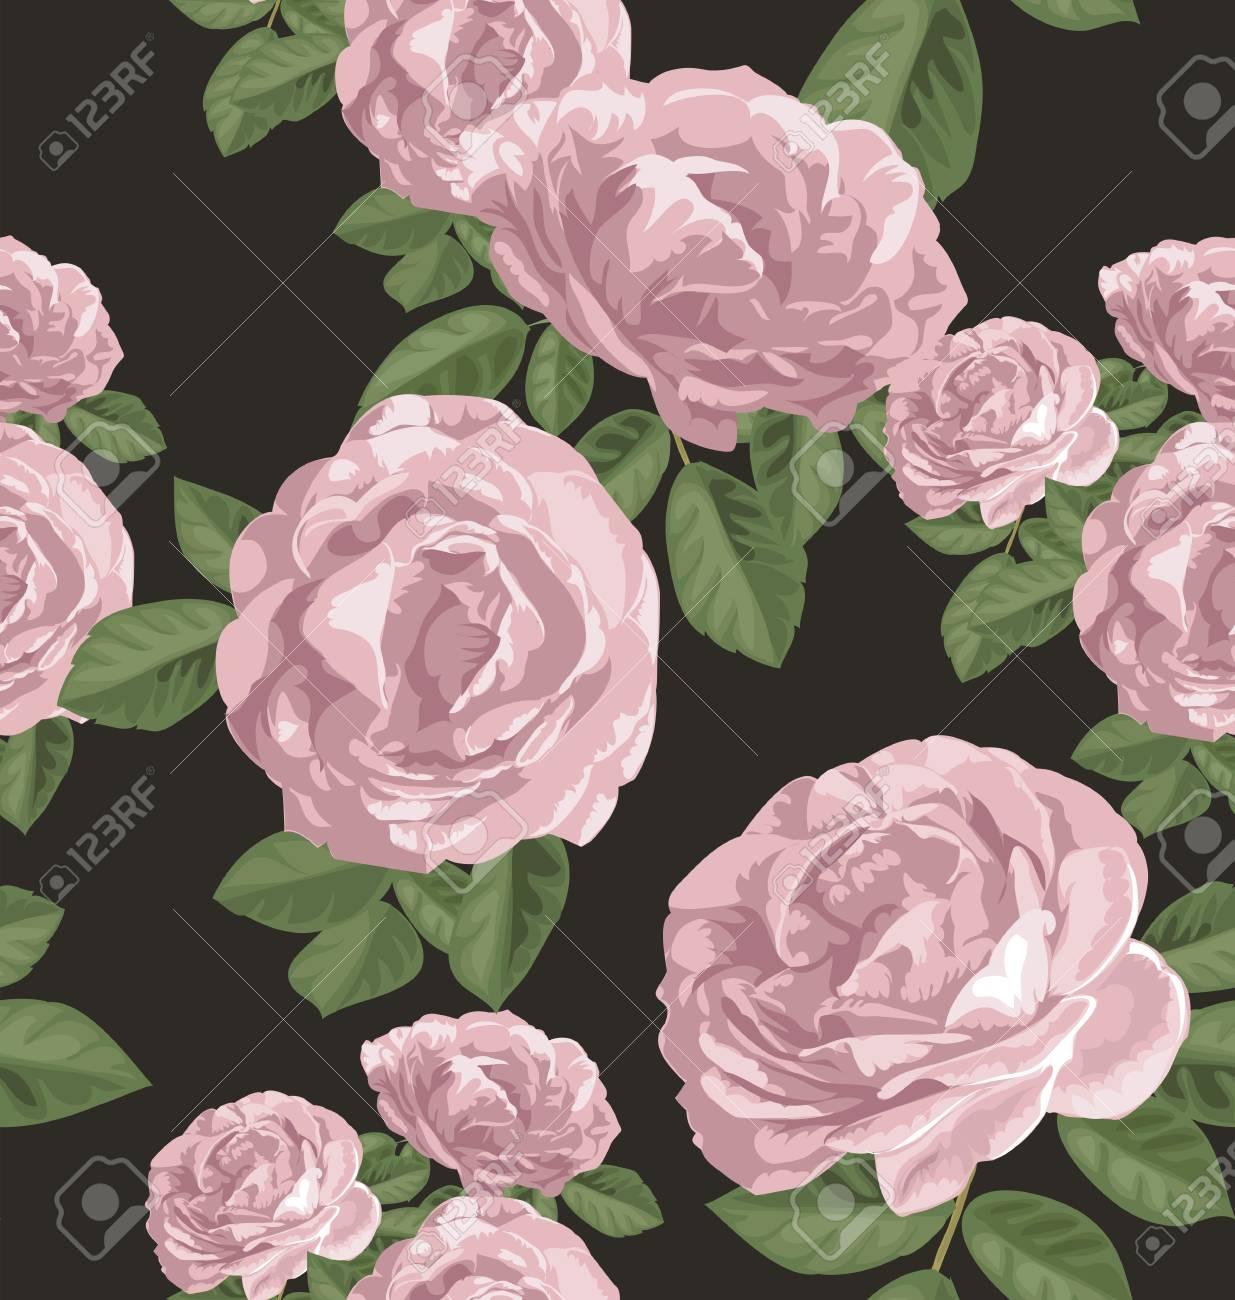 Illustration of rose seamless pattern - 48904460